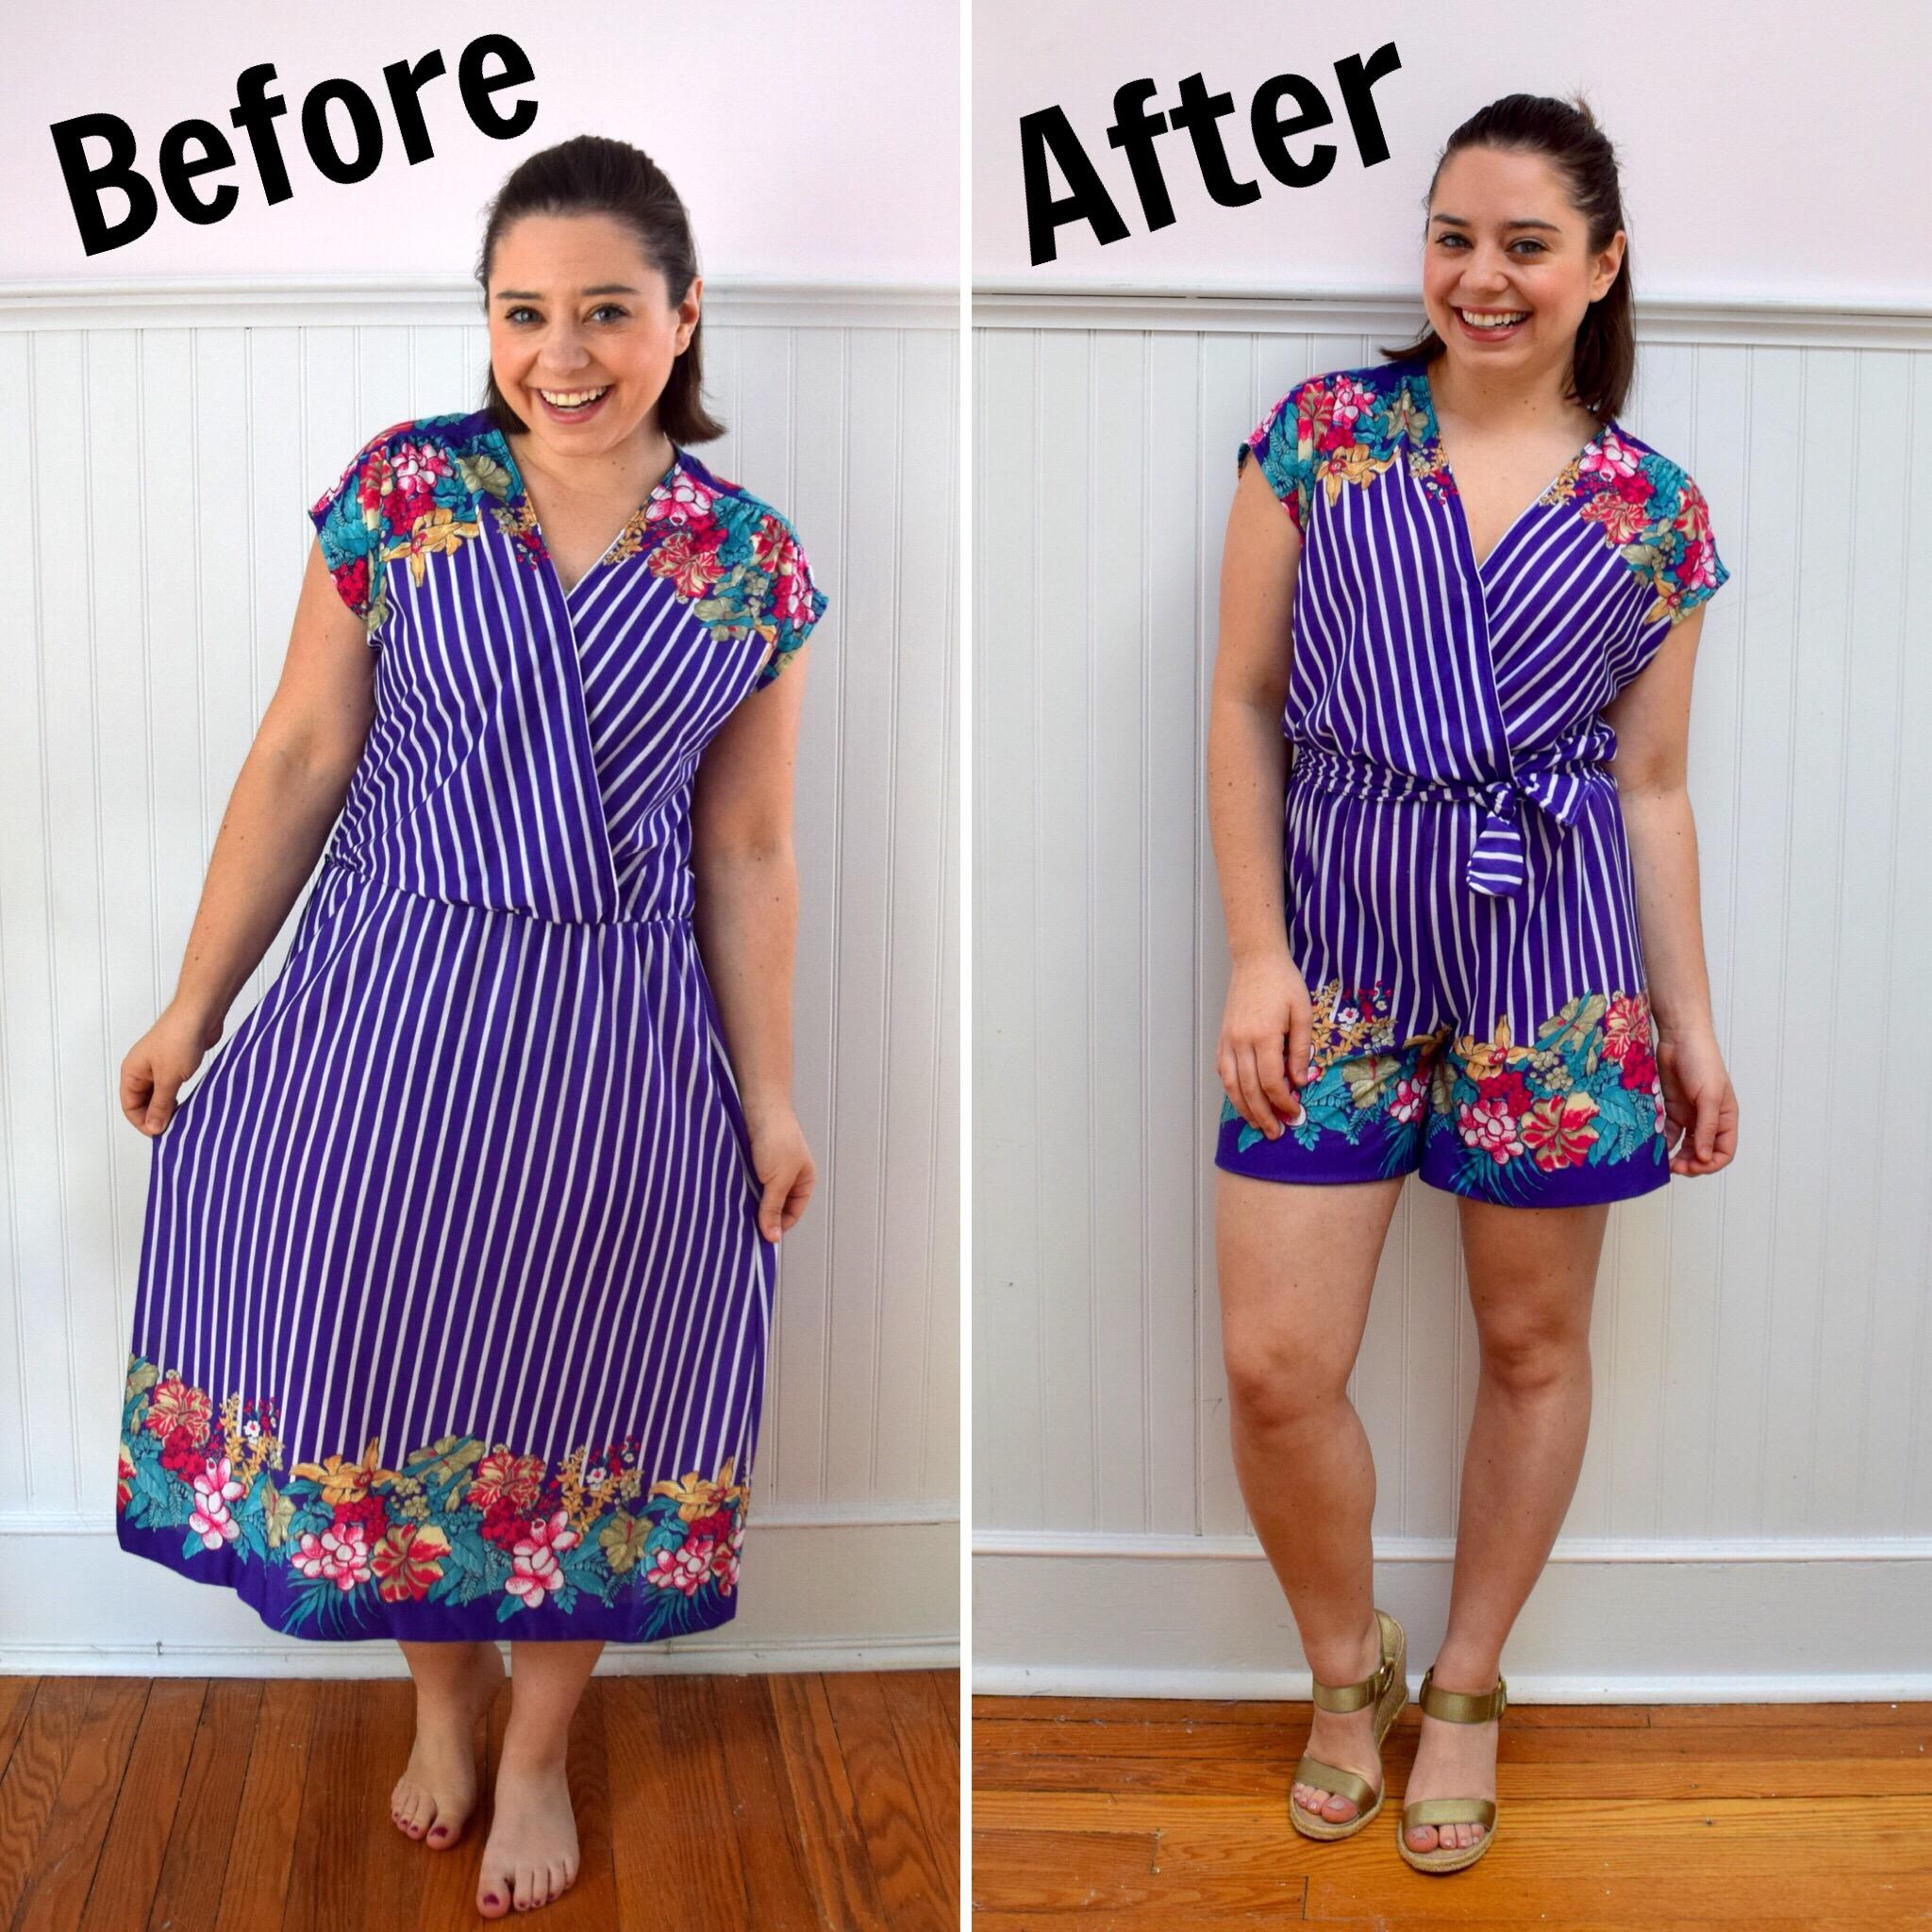 Refashion Friday: Dress to Romper Refashion - Trish Stitched